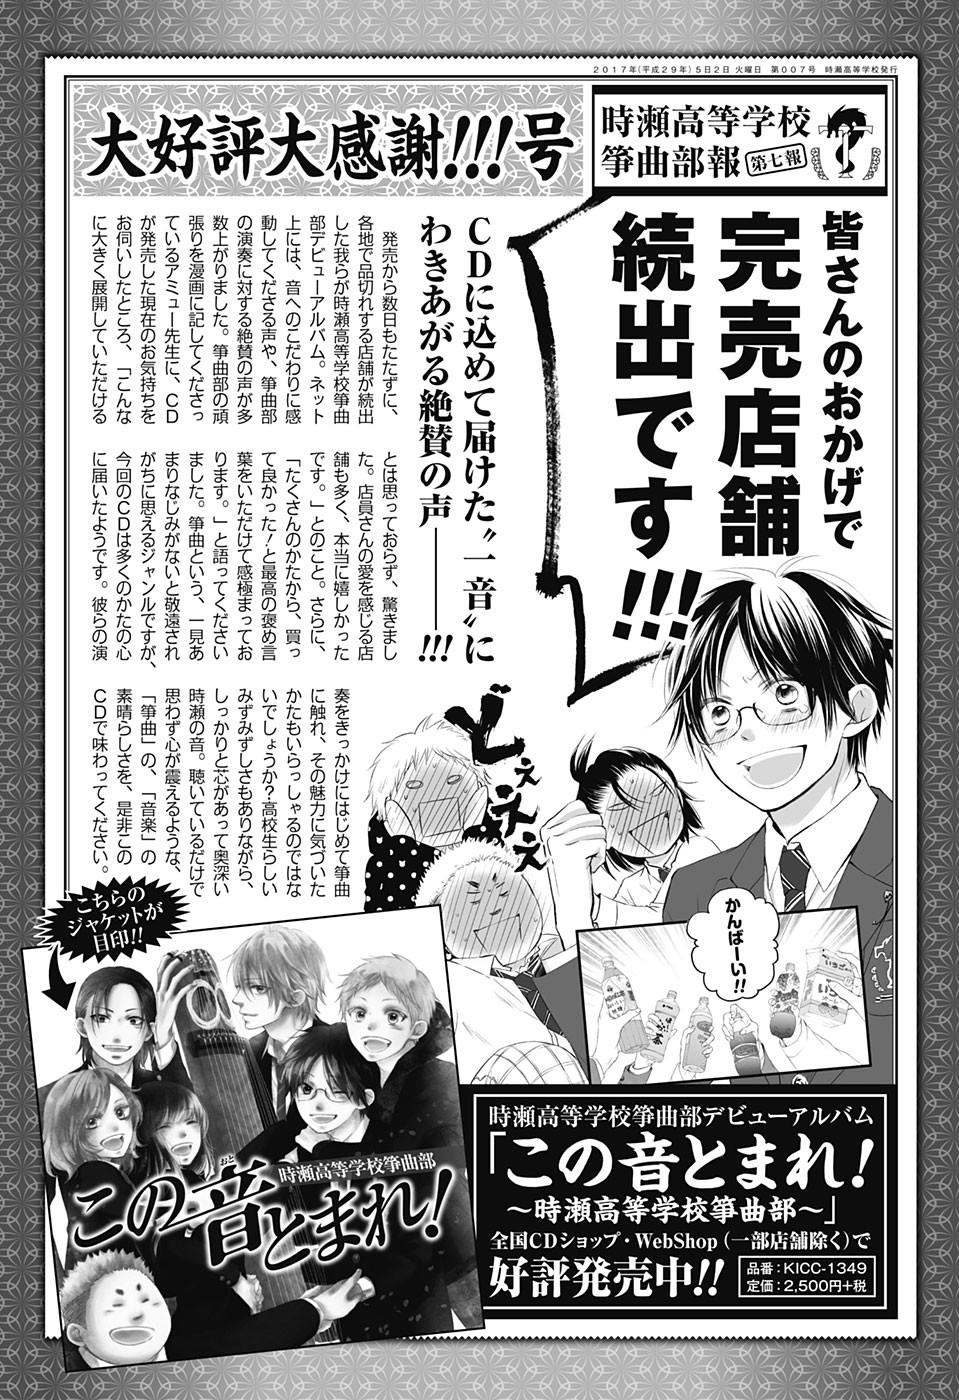 Kono-Oto-Tomare! Chapter 58 Page 1